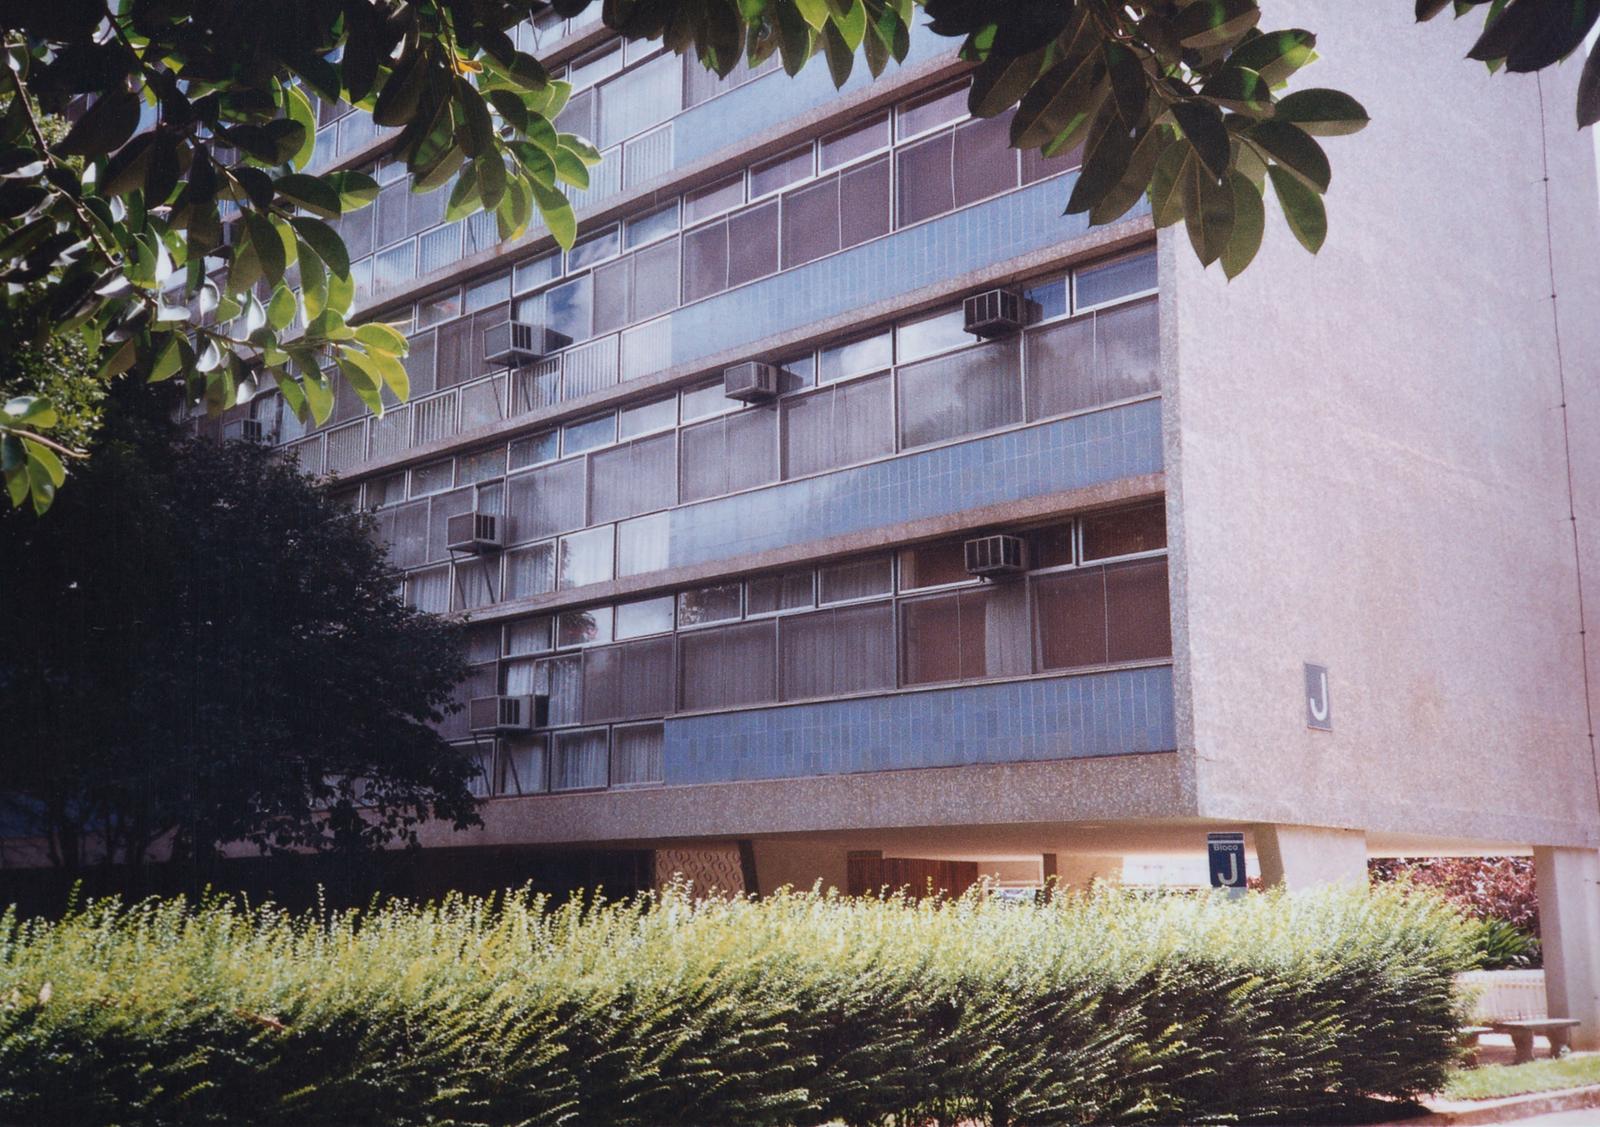 Brasilia - Principal Officer/Consul General Residence - 1988